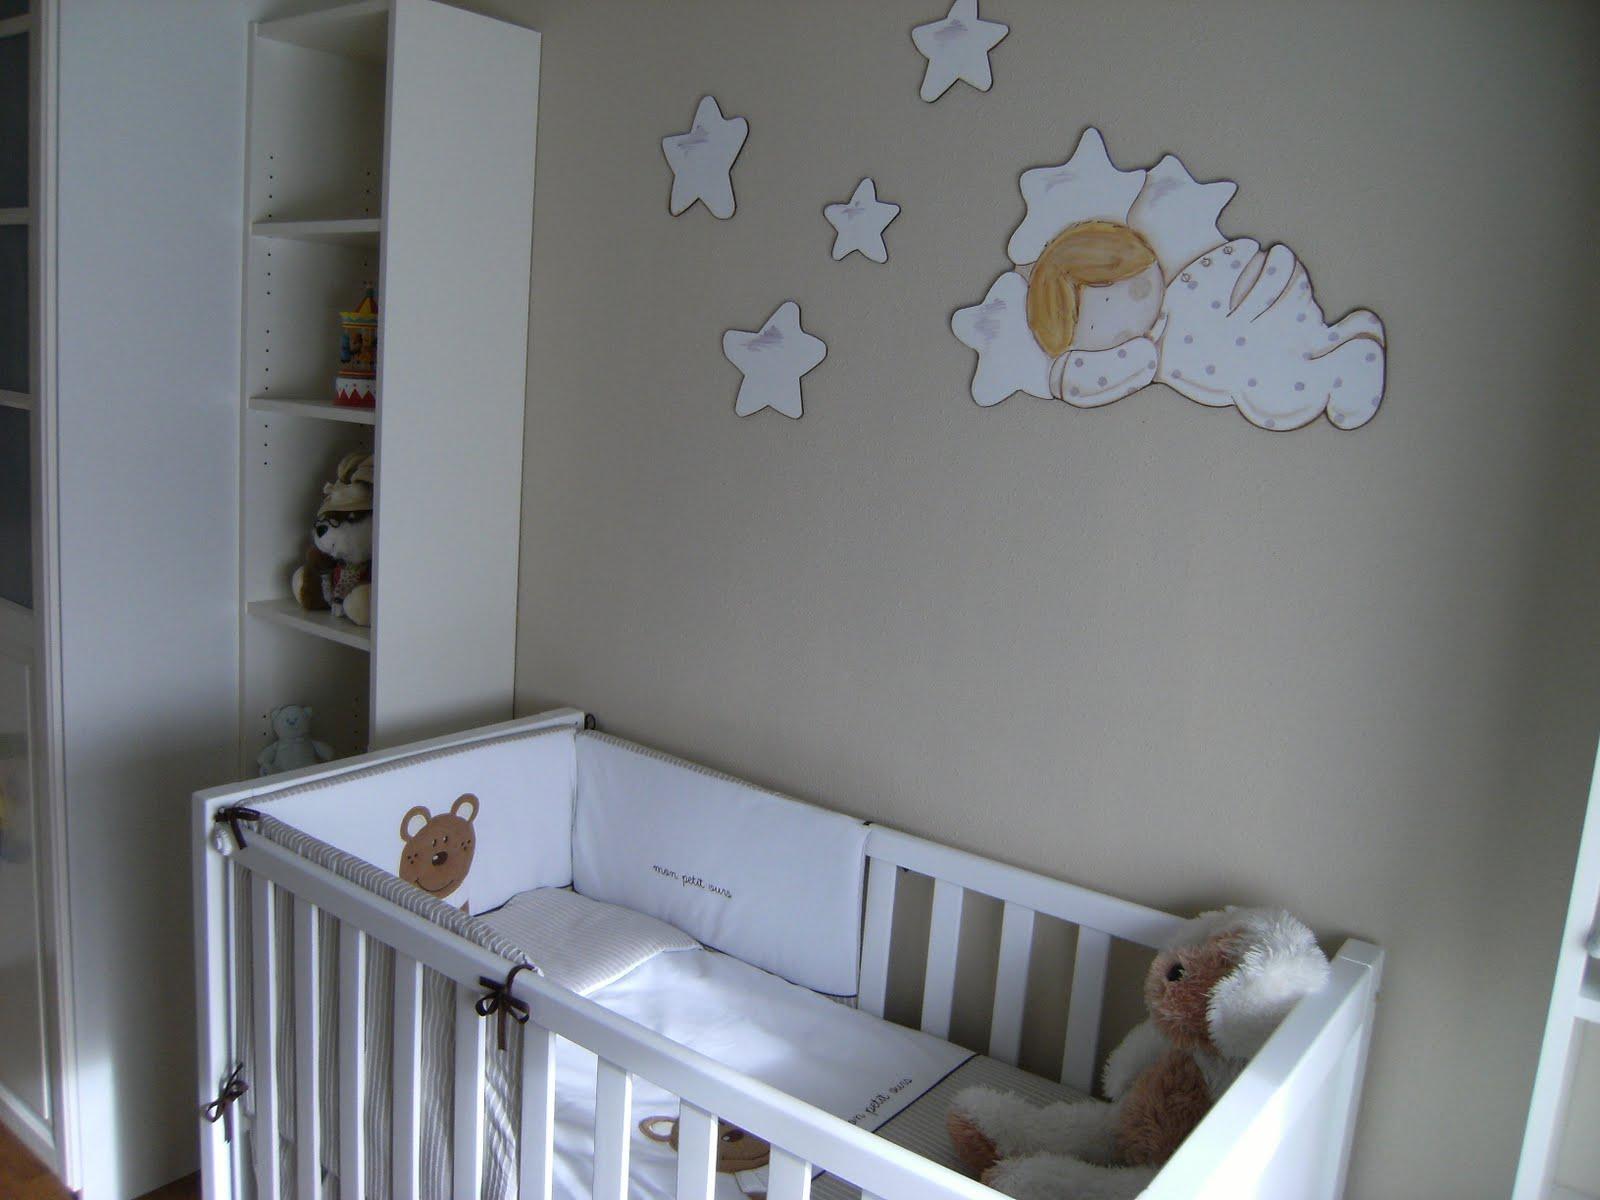 Deco chambre b b chambre d 39 enfant - Chambre d enfant deco ...